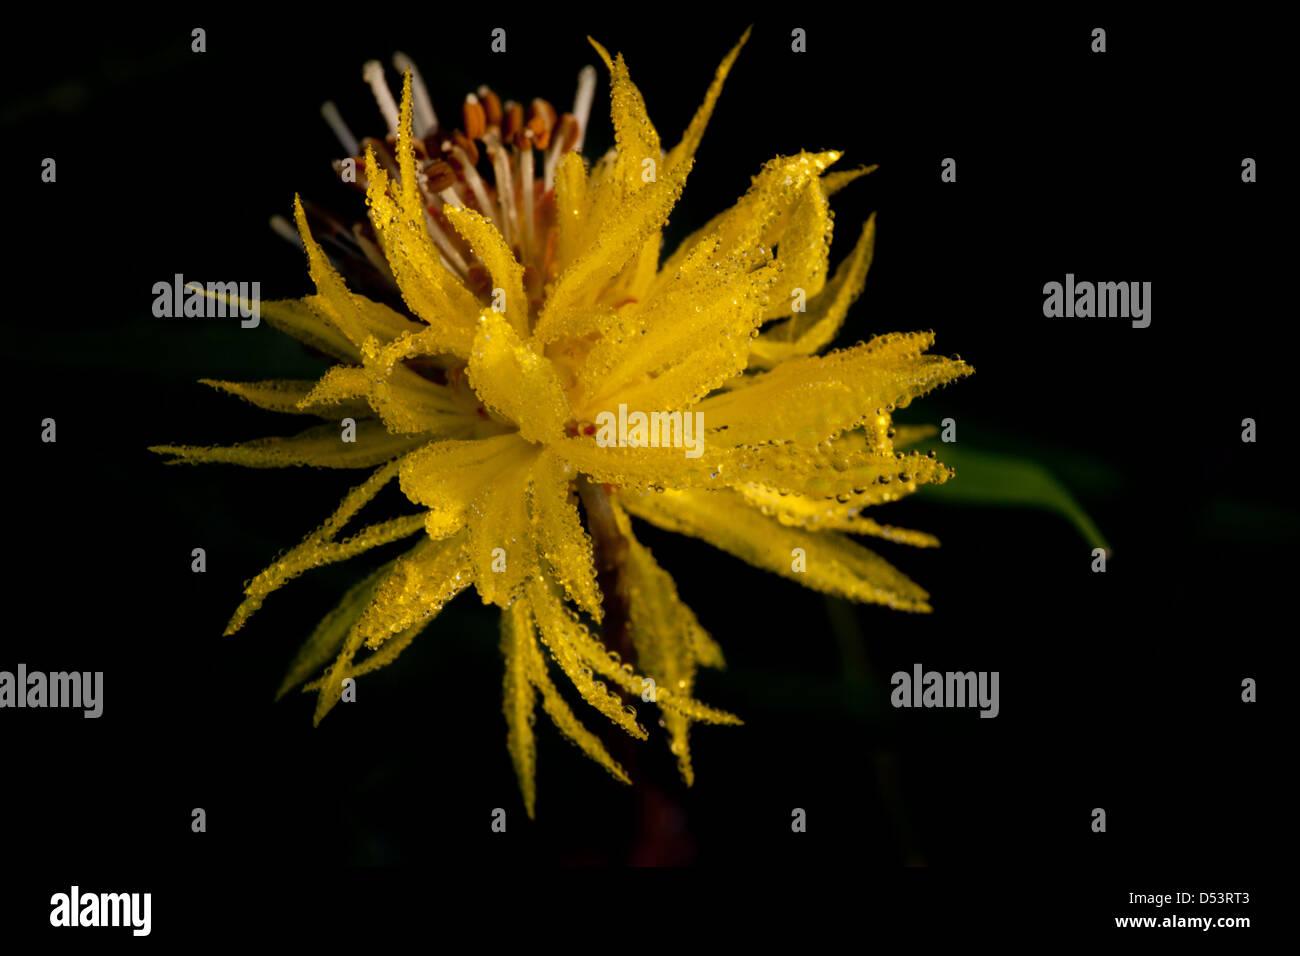 Yellow flower at Cienaga las Macanas nature reserve, Herrera province, Republic of Panama. Stock Photo